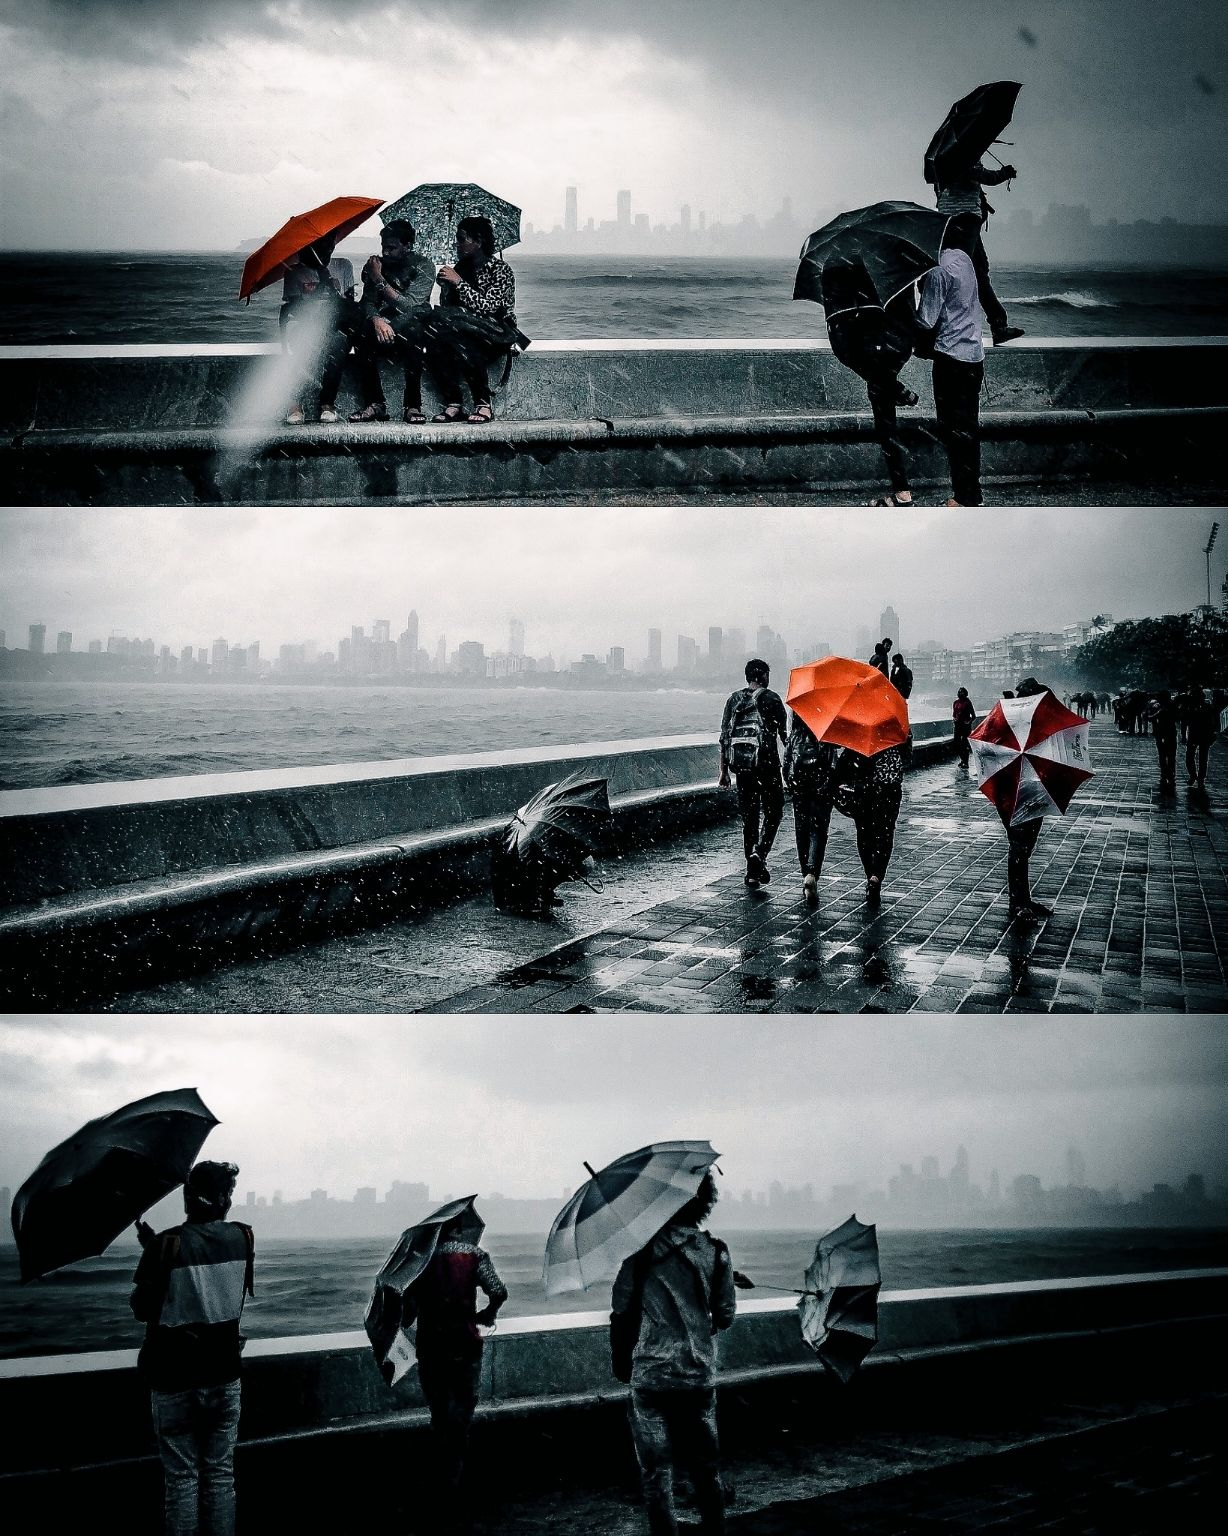 Photo of Mumbai By akshay pandey